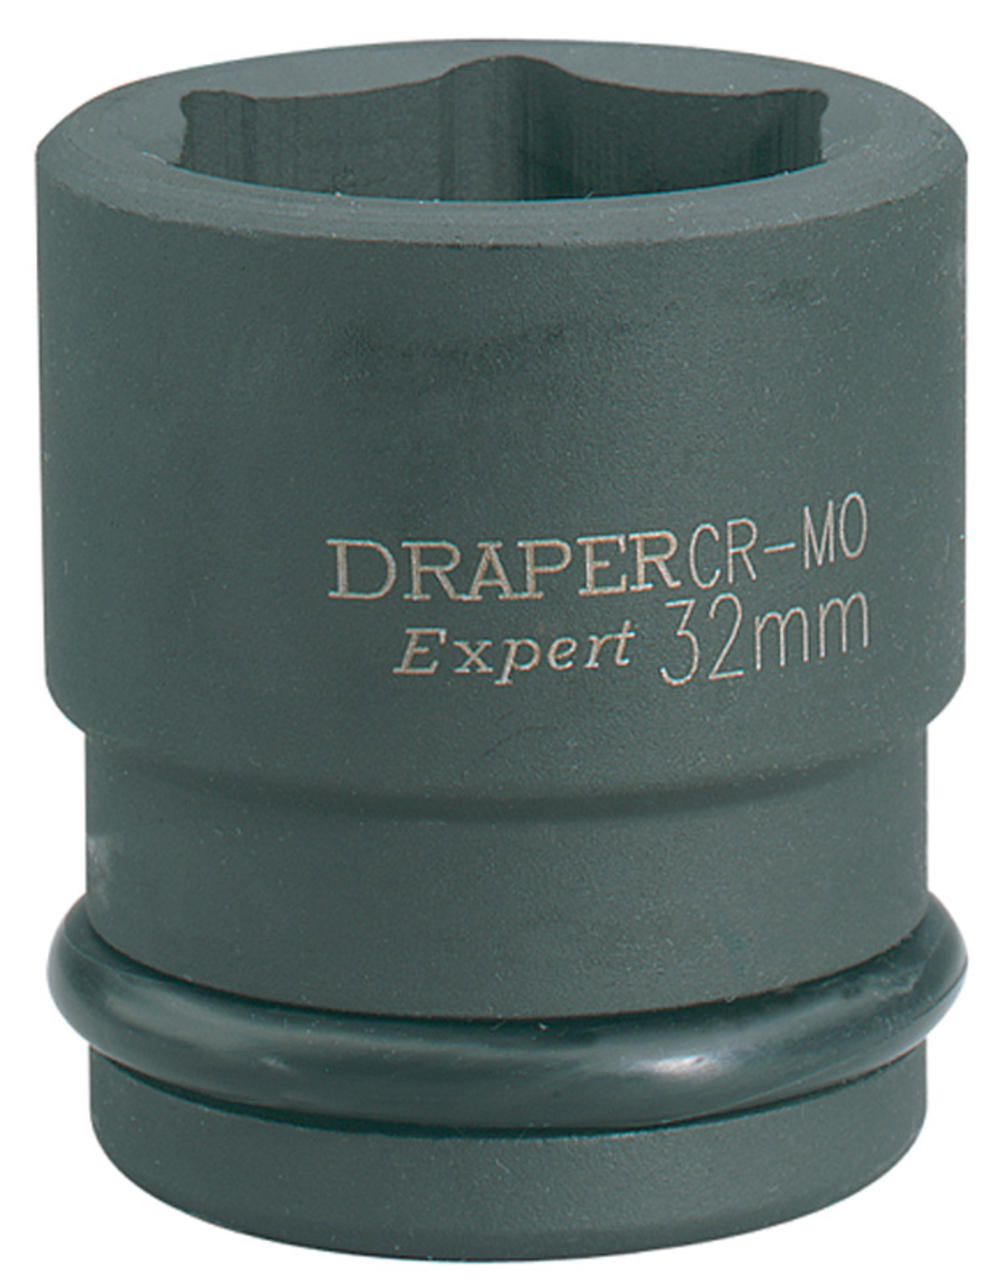 "Draper 5028 Expert 46mm 3/4"" Square Drive Hi-Torq 6 Point Impact Socket"